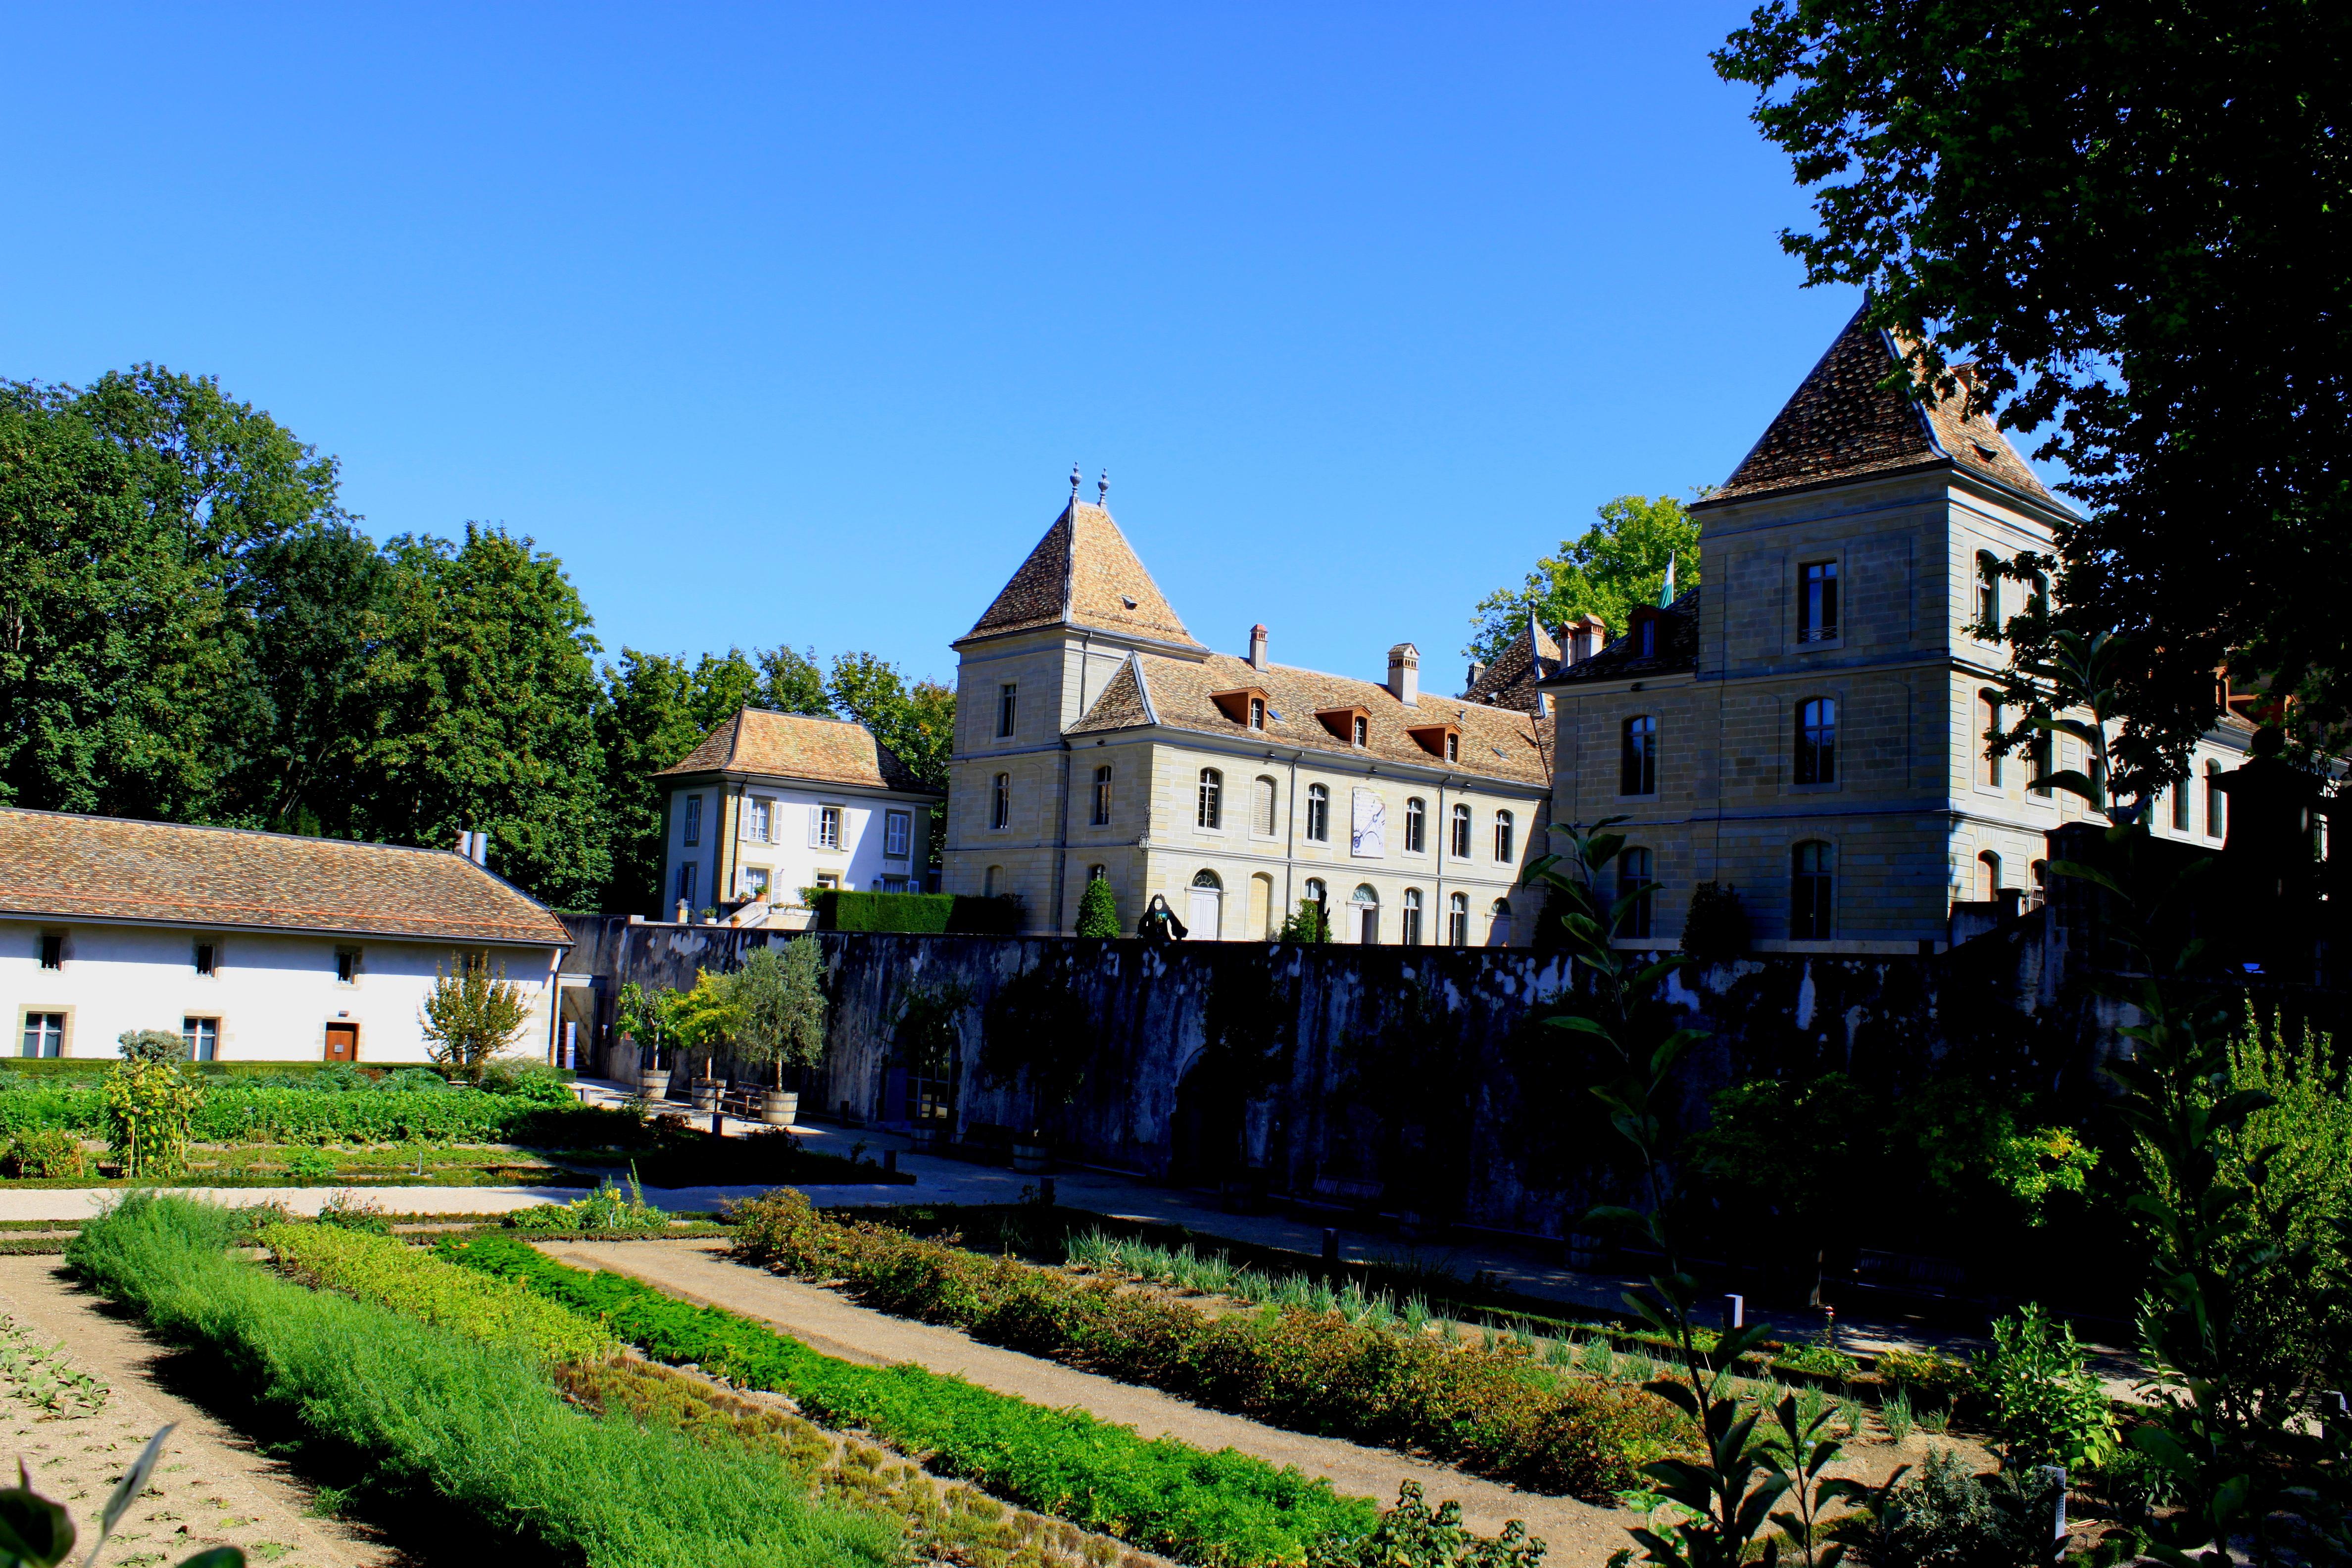 File:Château de Prangins 3.jpg - Wikimedia Commons